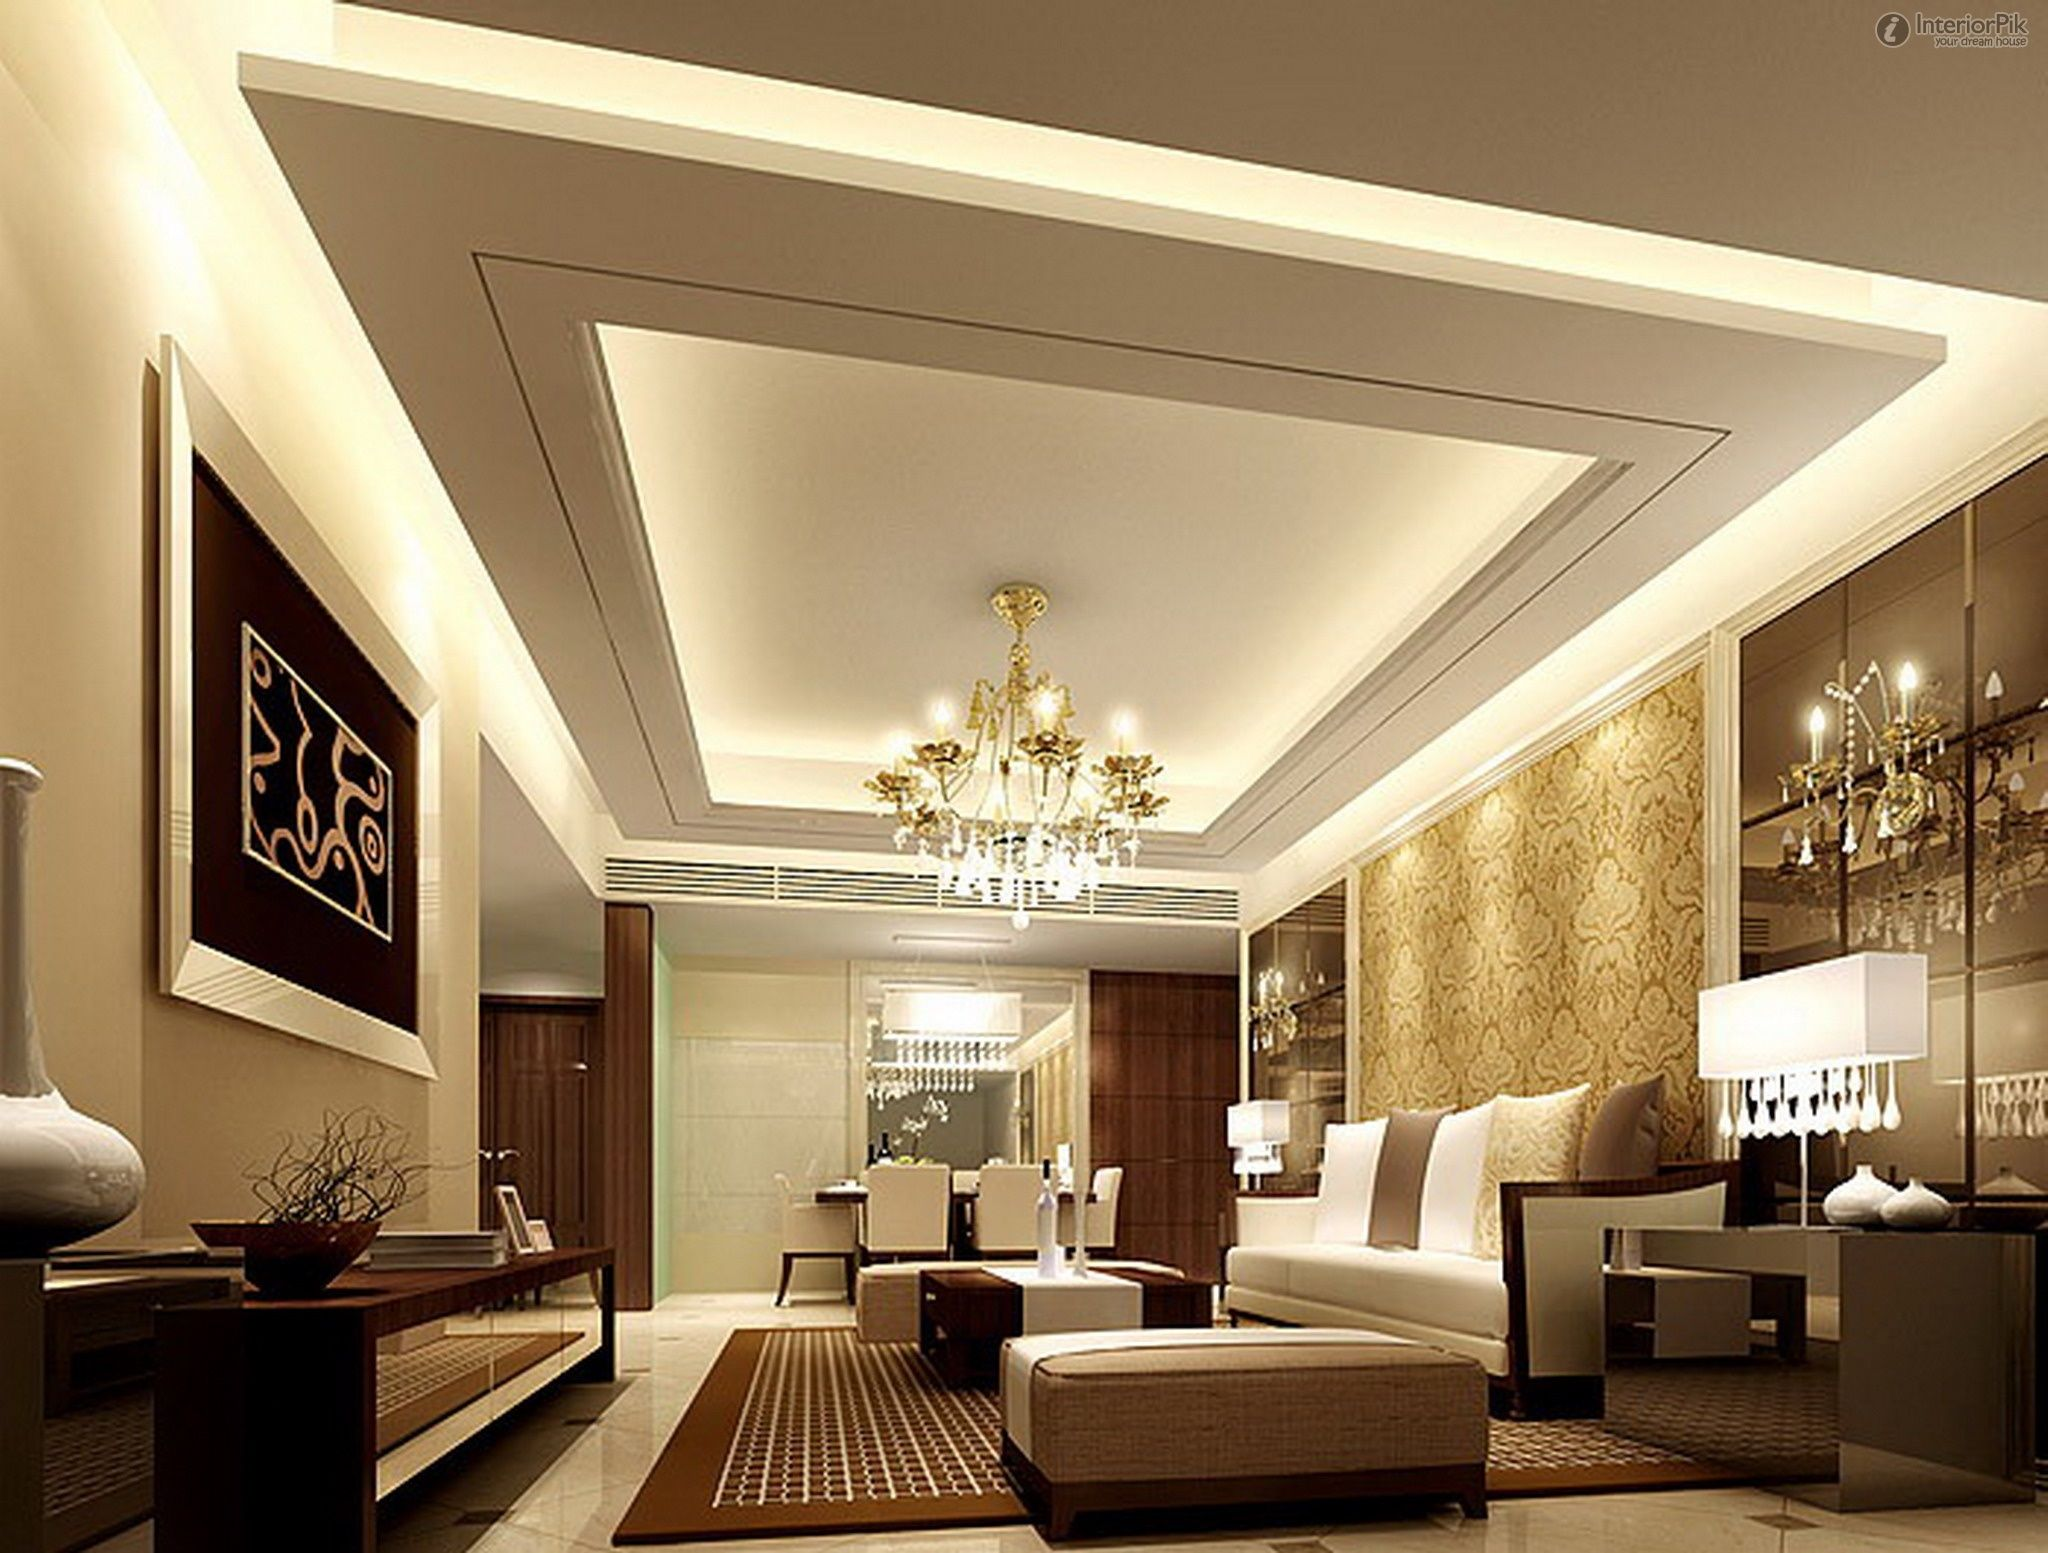 Vaulted Living Room Ideas Simple False Ceiling Design Ceiling